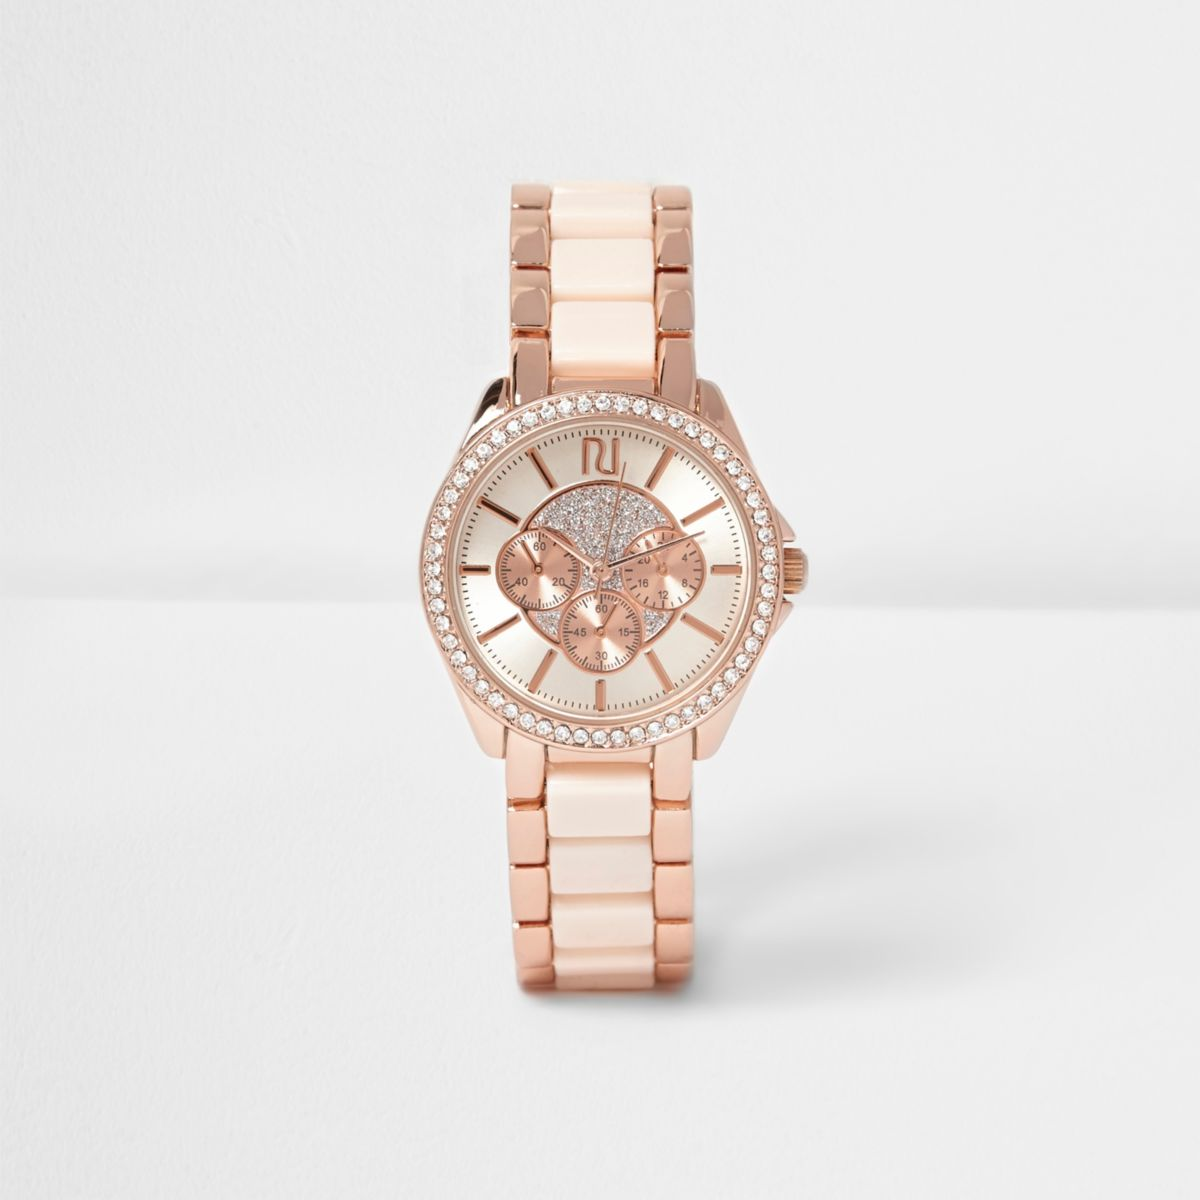 Rose gold tone rhinestone encrusted watch